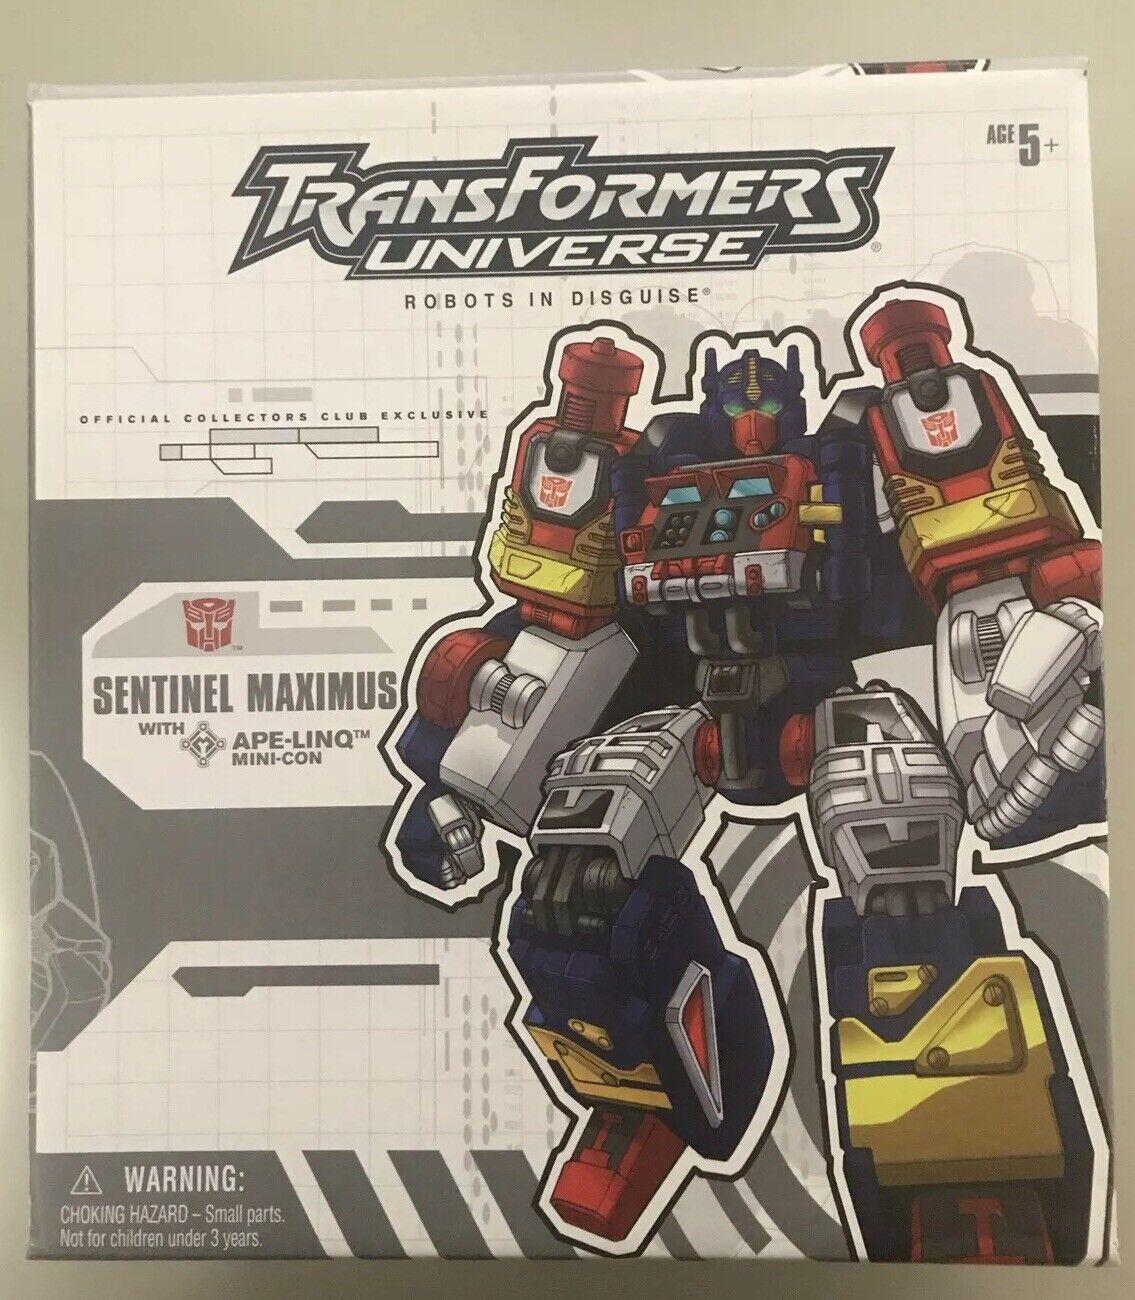 Transformers OTFCC 2004 botcon Sentinel Maximus Caja Burbuja instrucción no figura